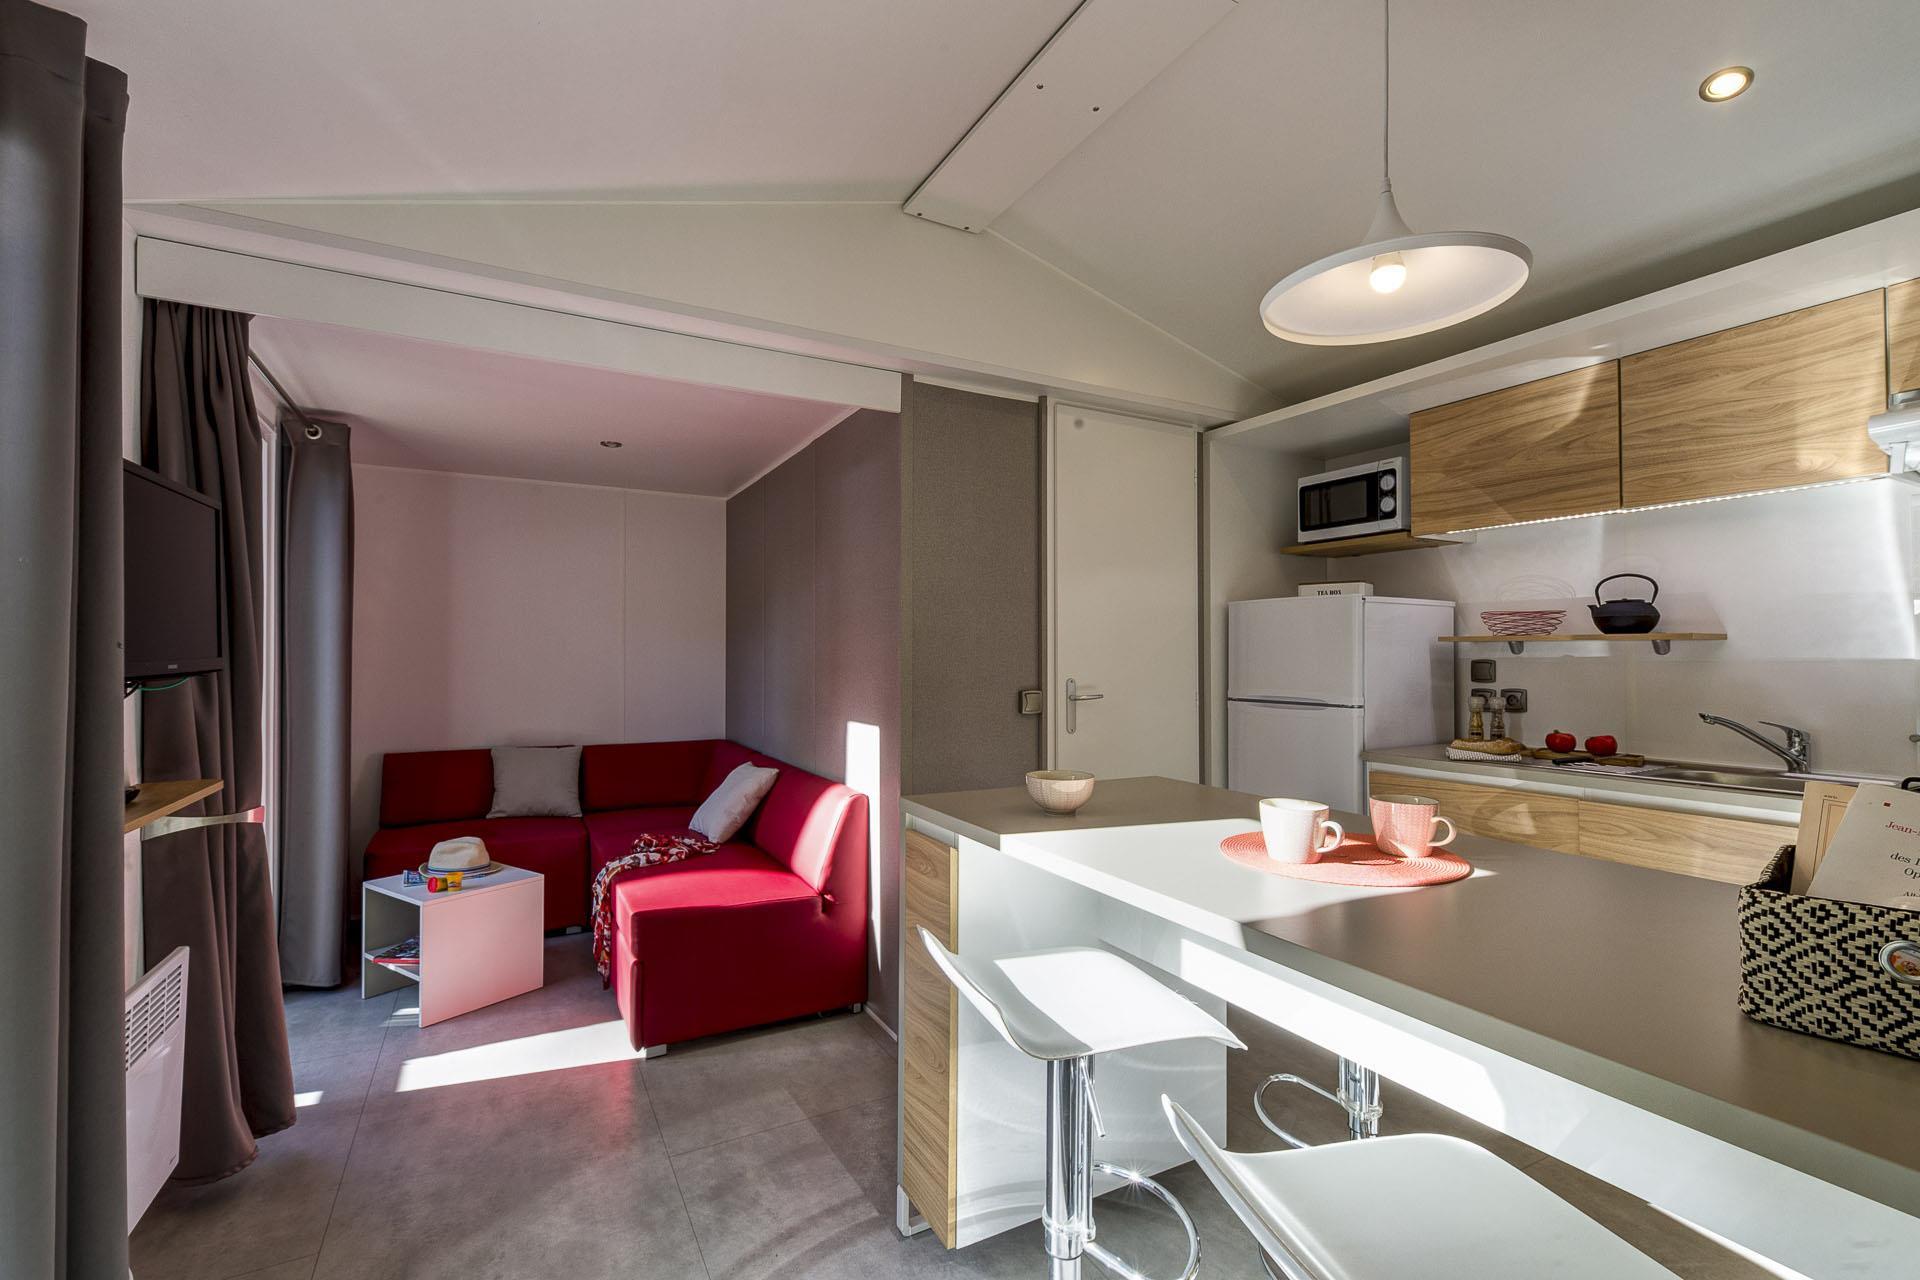 Location - Cottage Confort 2 Chambres *** - Camping Sandaya L'Orée du Bois